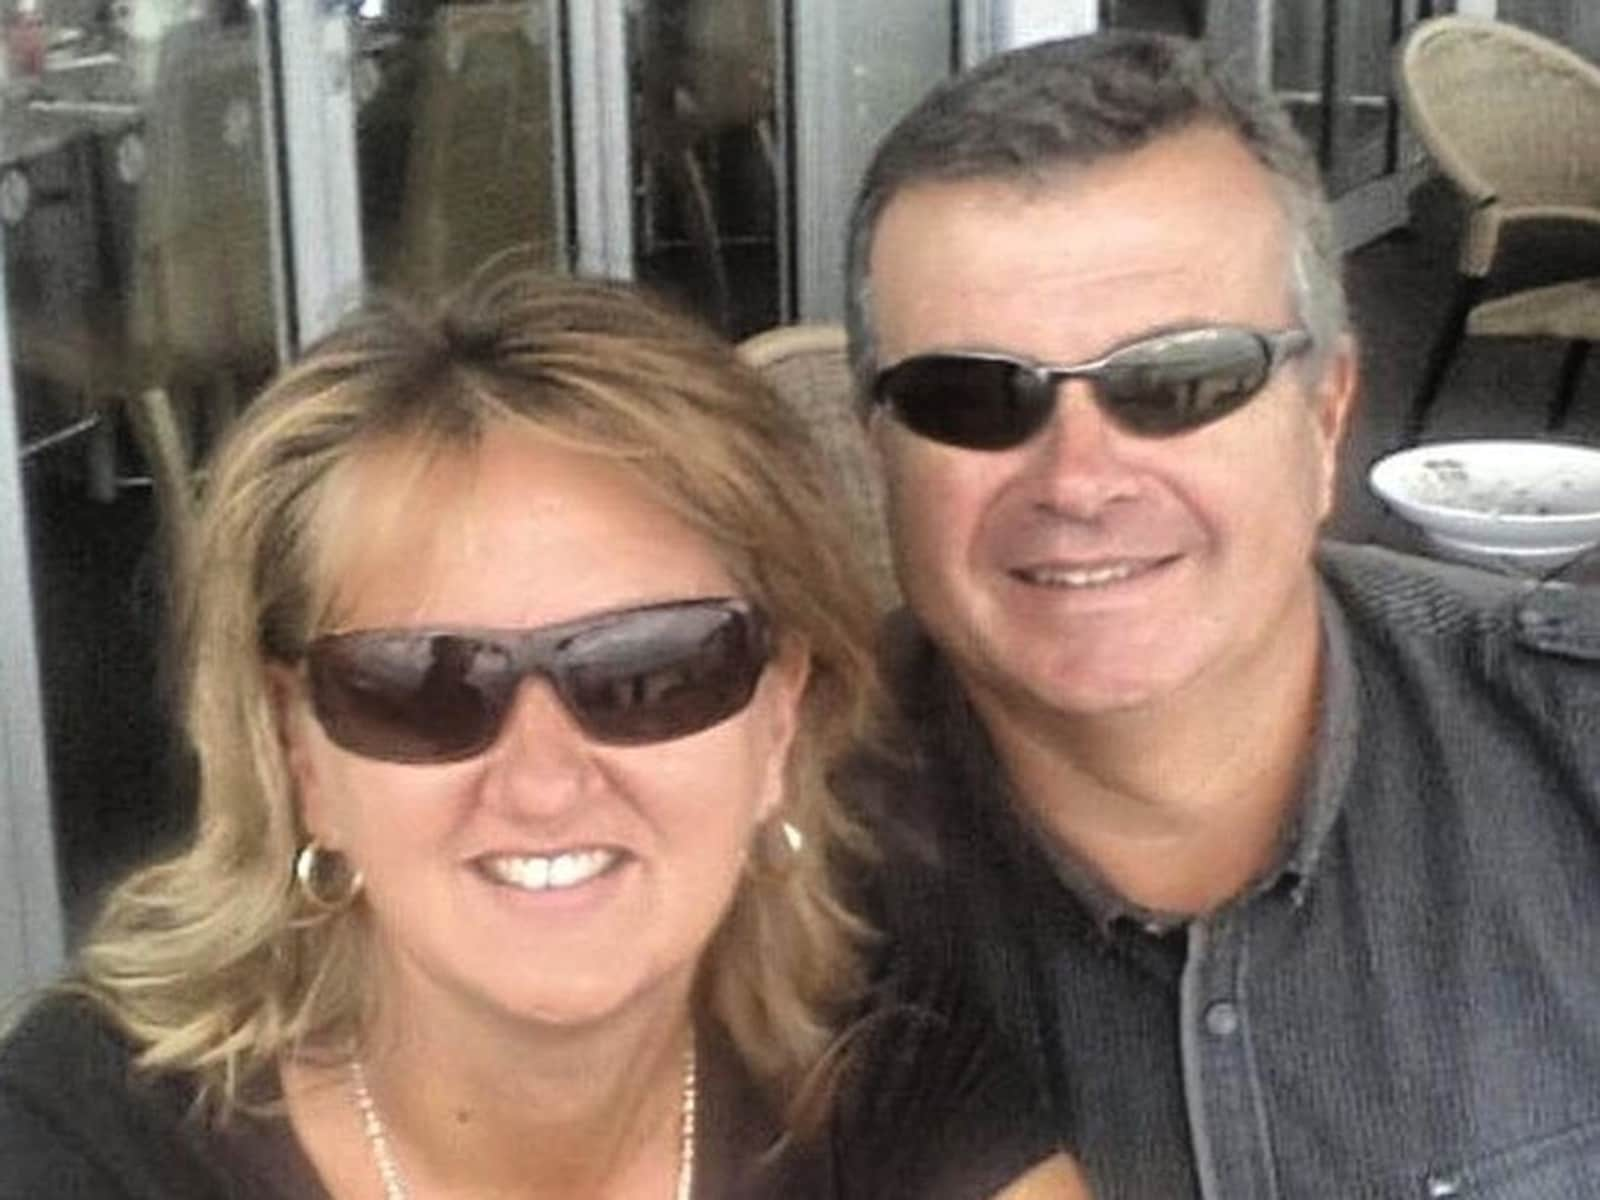 Glenn & Sue from Lennox Head, New South Wales, Australia